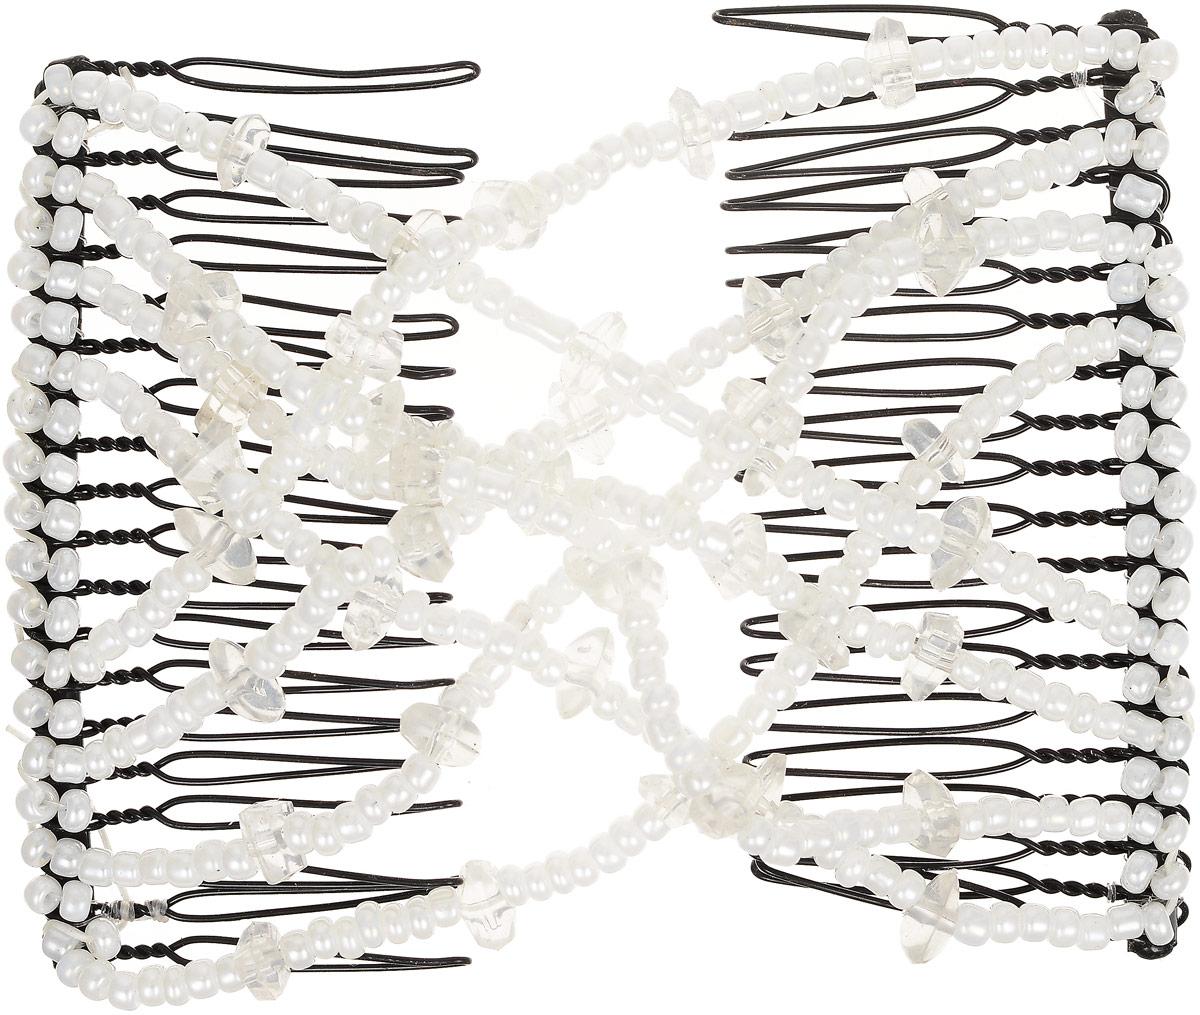 EZ-Combs Заколка Изи-Комбс, одинарная, цвет: белый. ЗИО_осколки